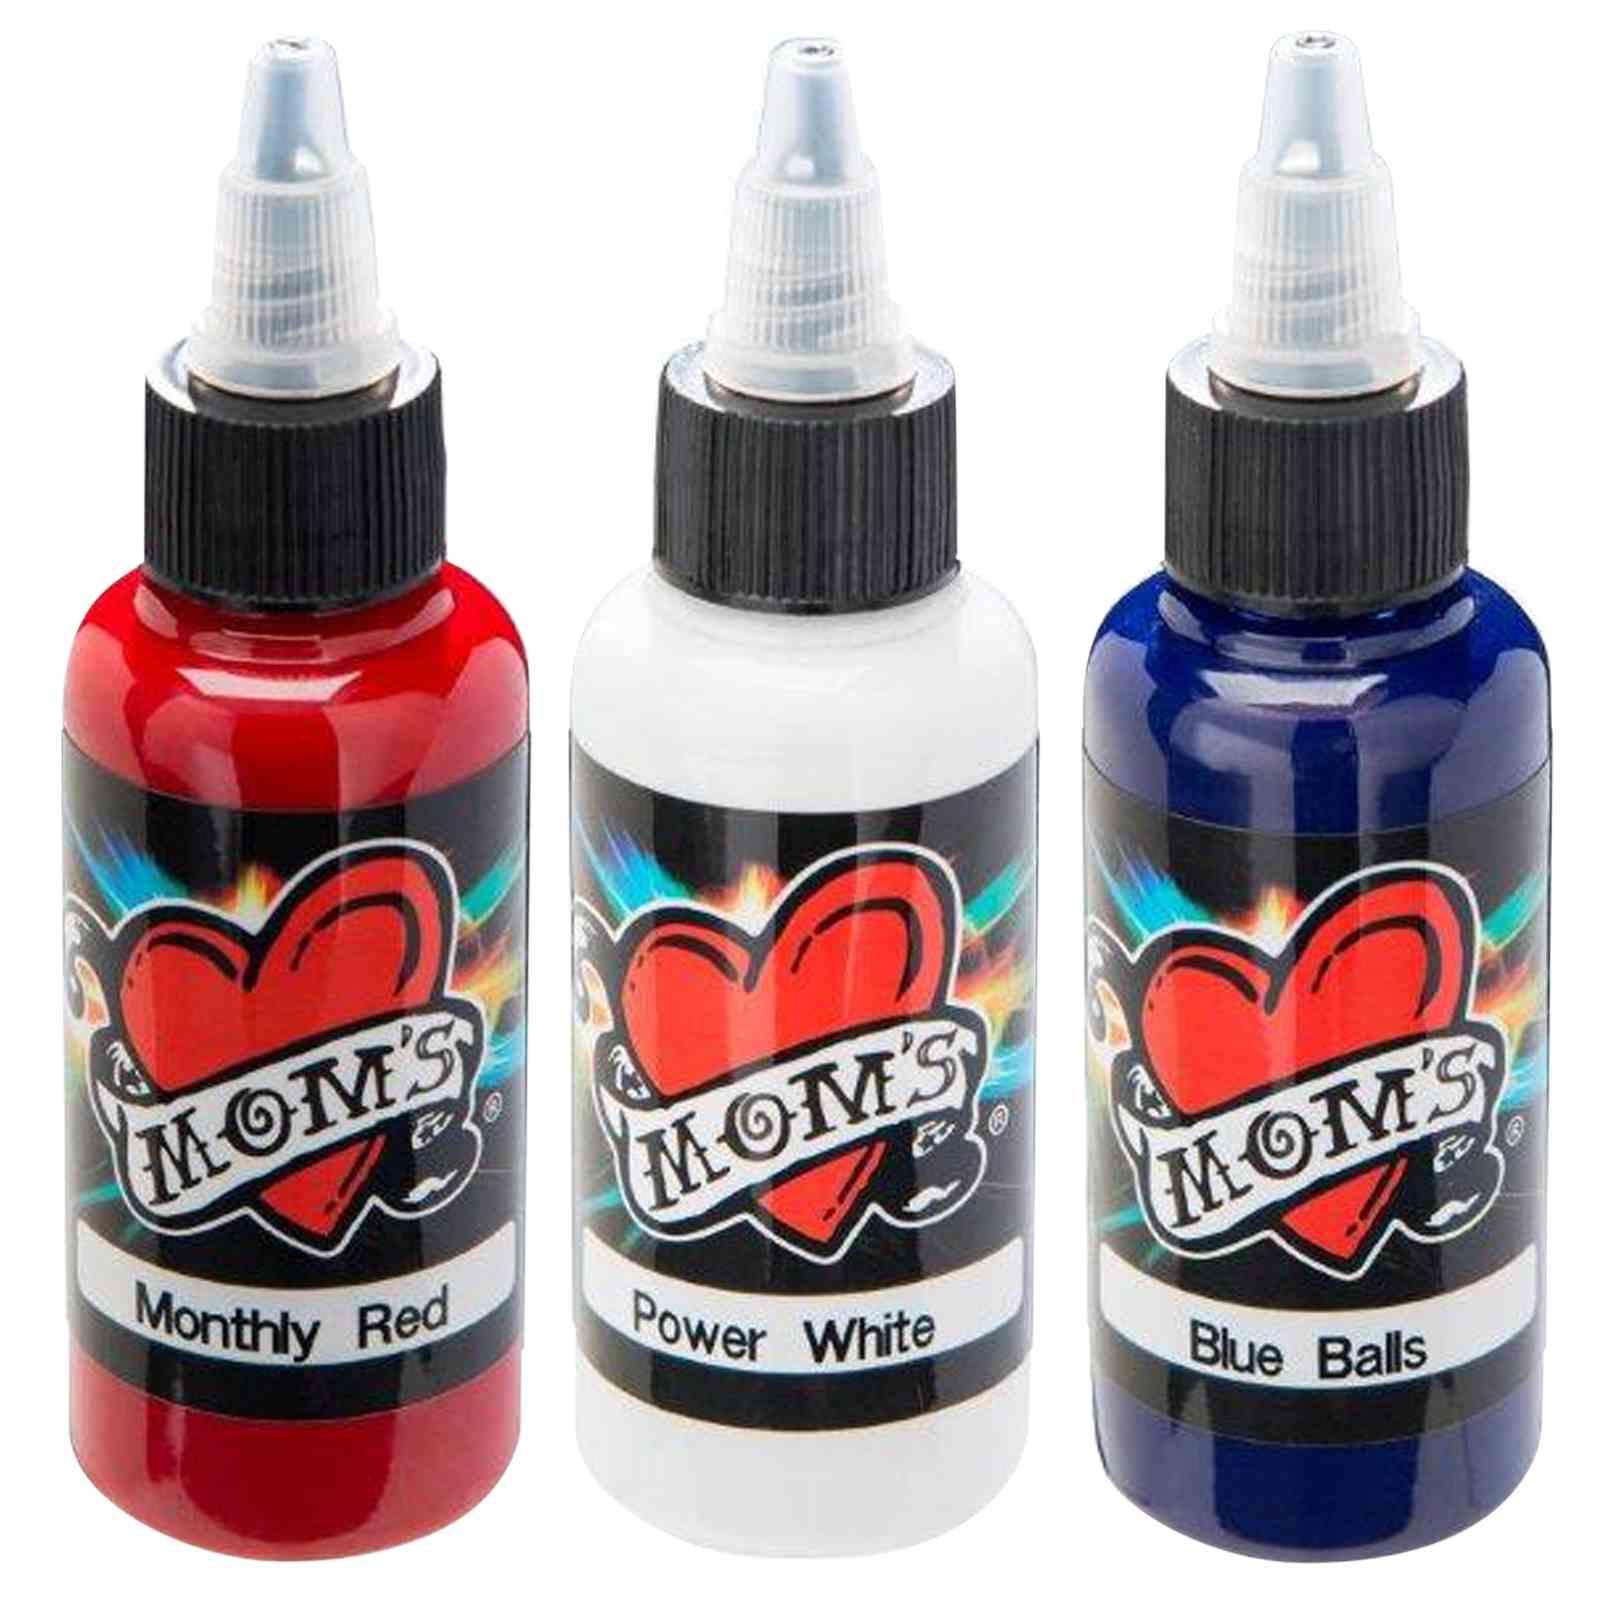 Moms millennium tattoo ink set red white blue 1 2 oz for Millennium colorworks tattoo ink